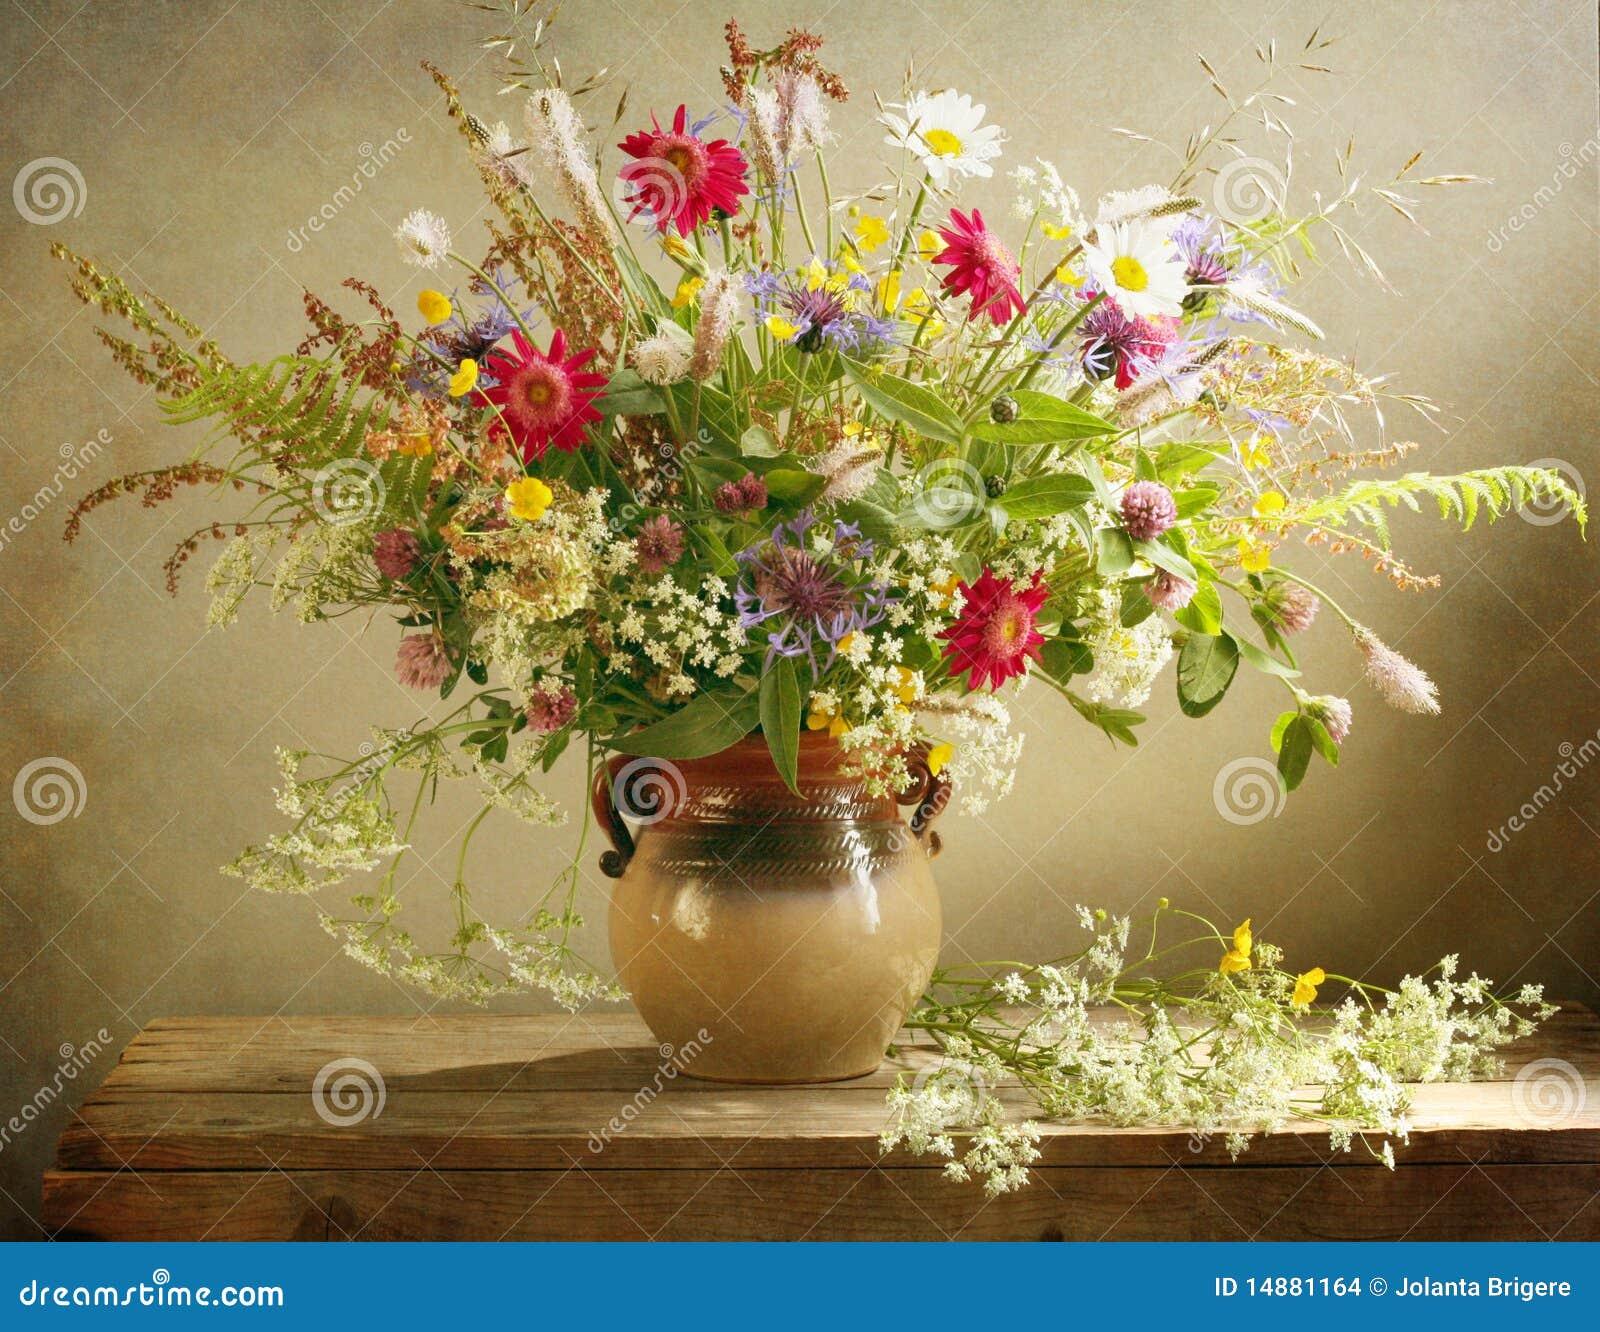 Herbage bouquet